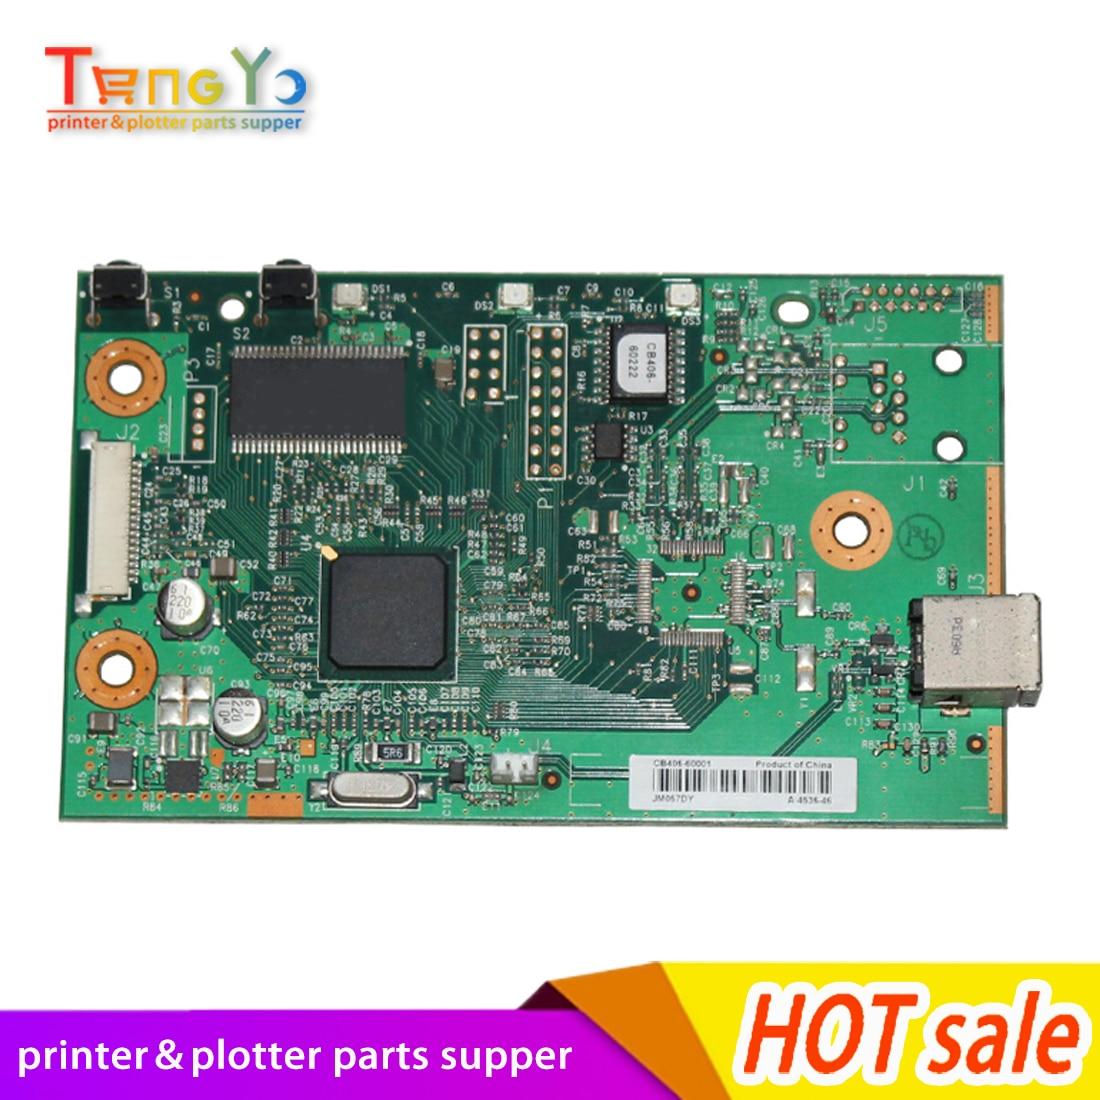 Logic Main Board Use For HP LaserJet 1022 HP1022 Formatter Board Mainboard CB406-60001 Q5427-60001